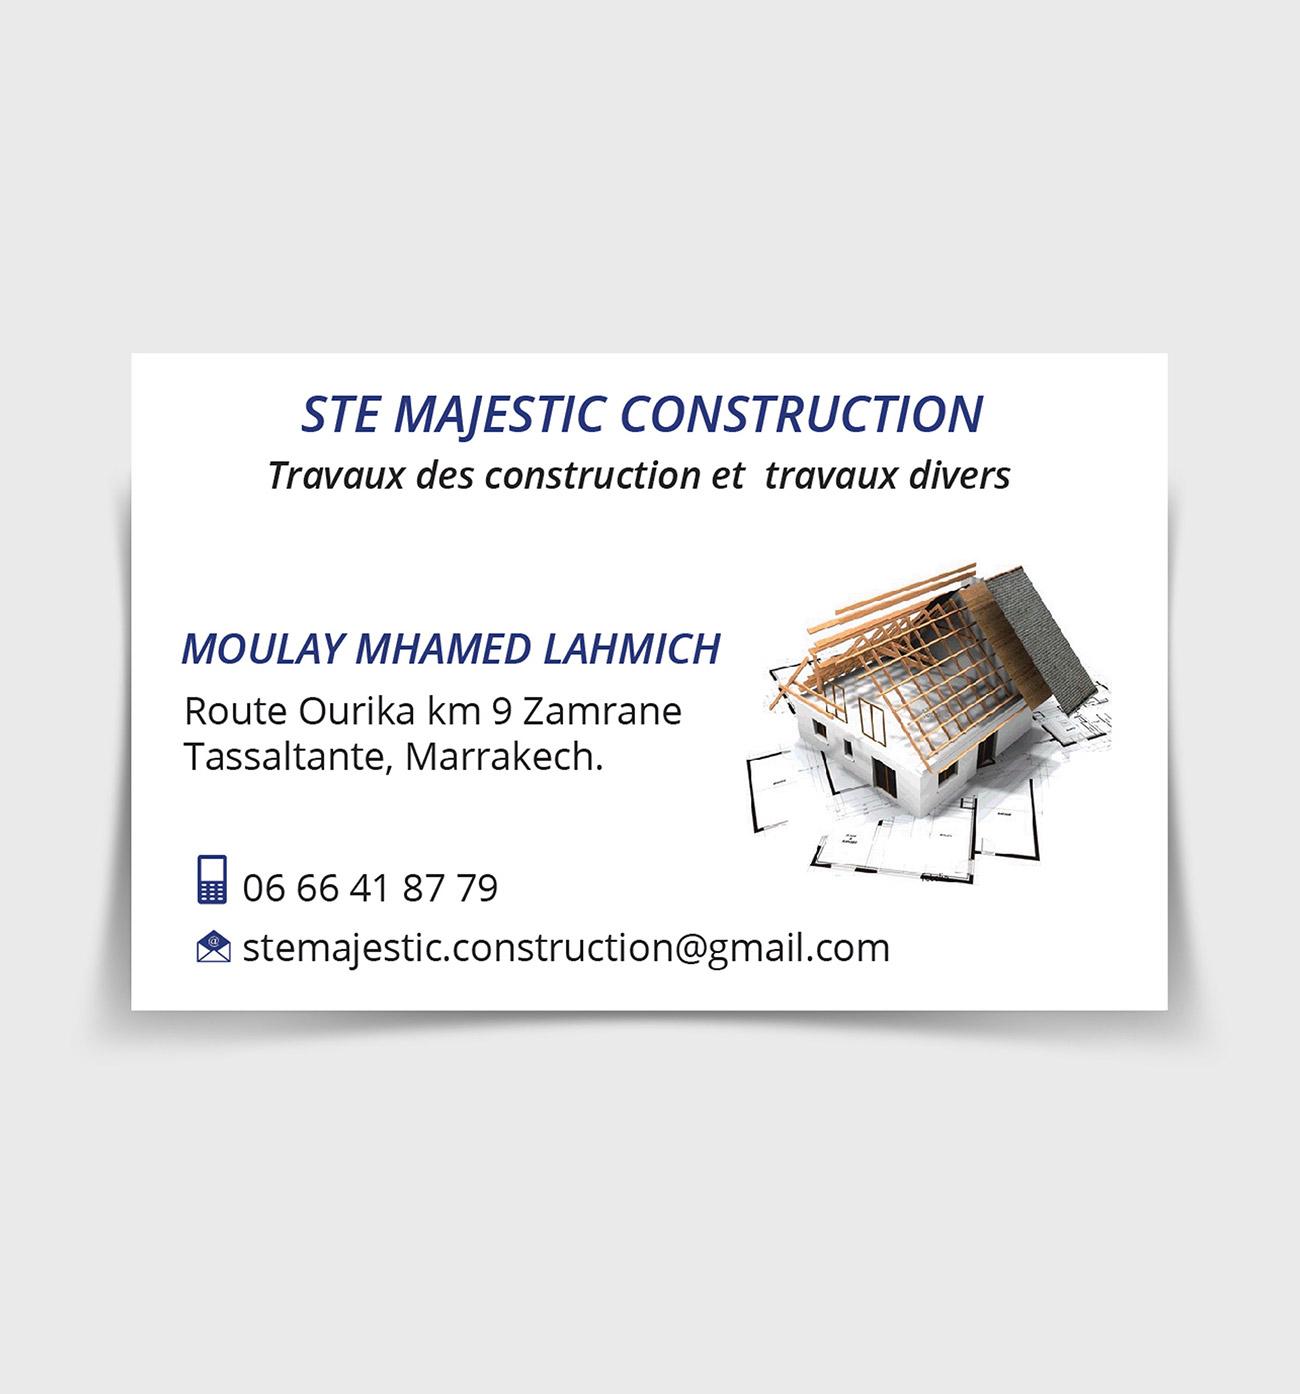 carte visite majestic construction